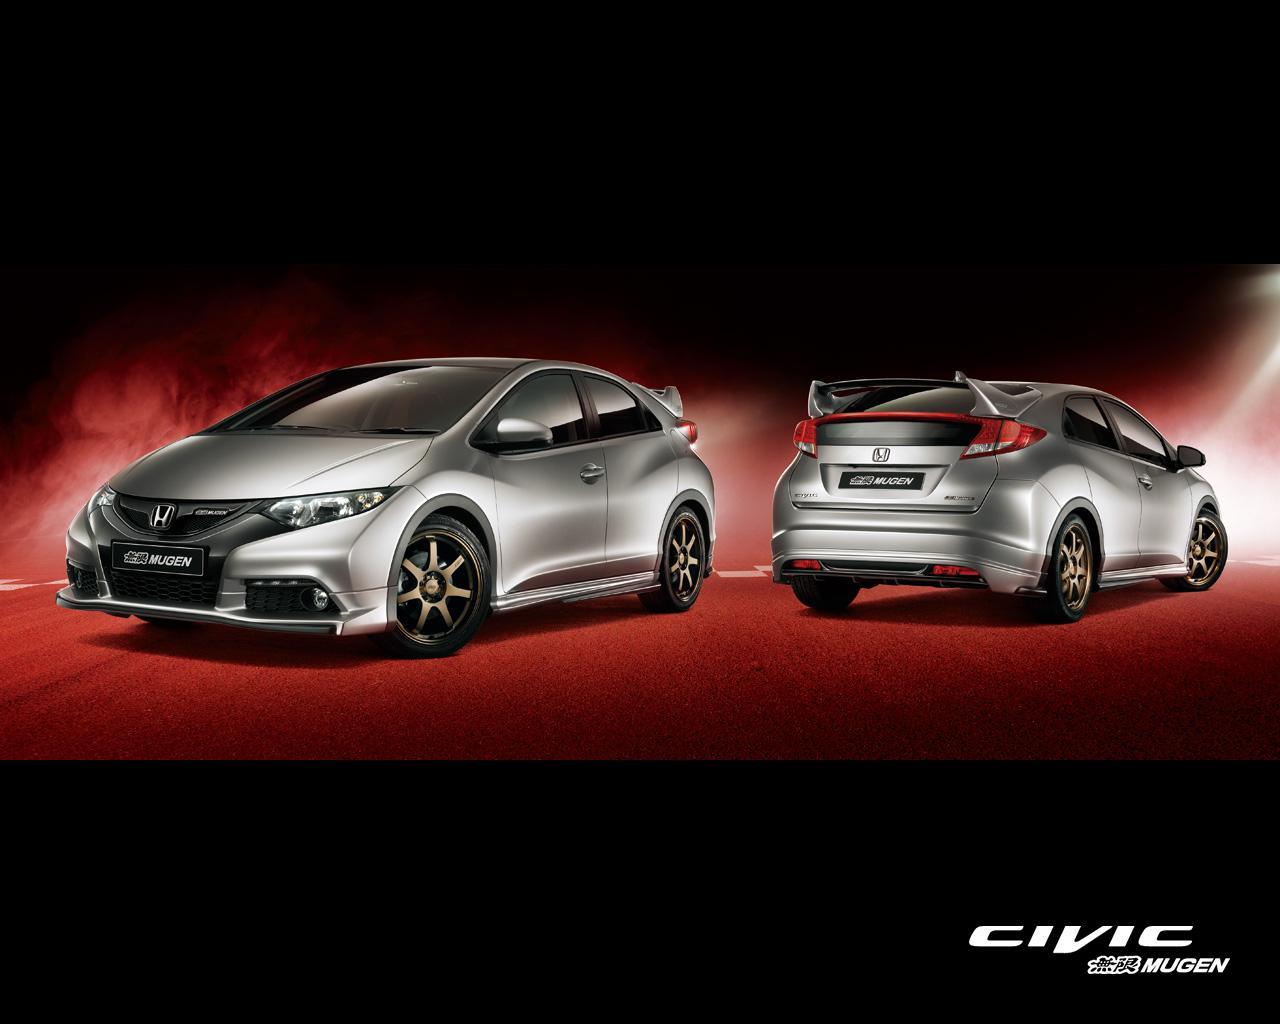 2013 Honda Accord Coupe For Sale >> Honda Civic Hatchback Gets Mugen Styling Pack - autoevolution